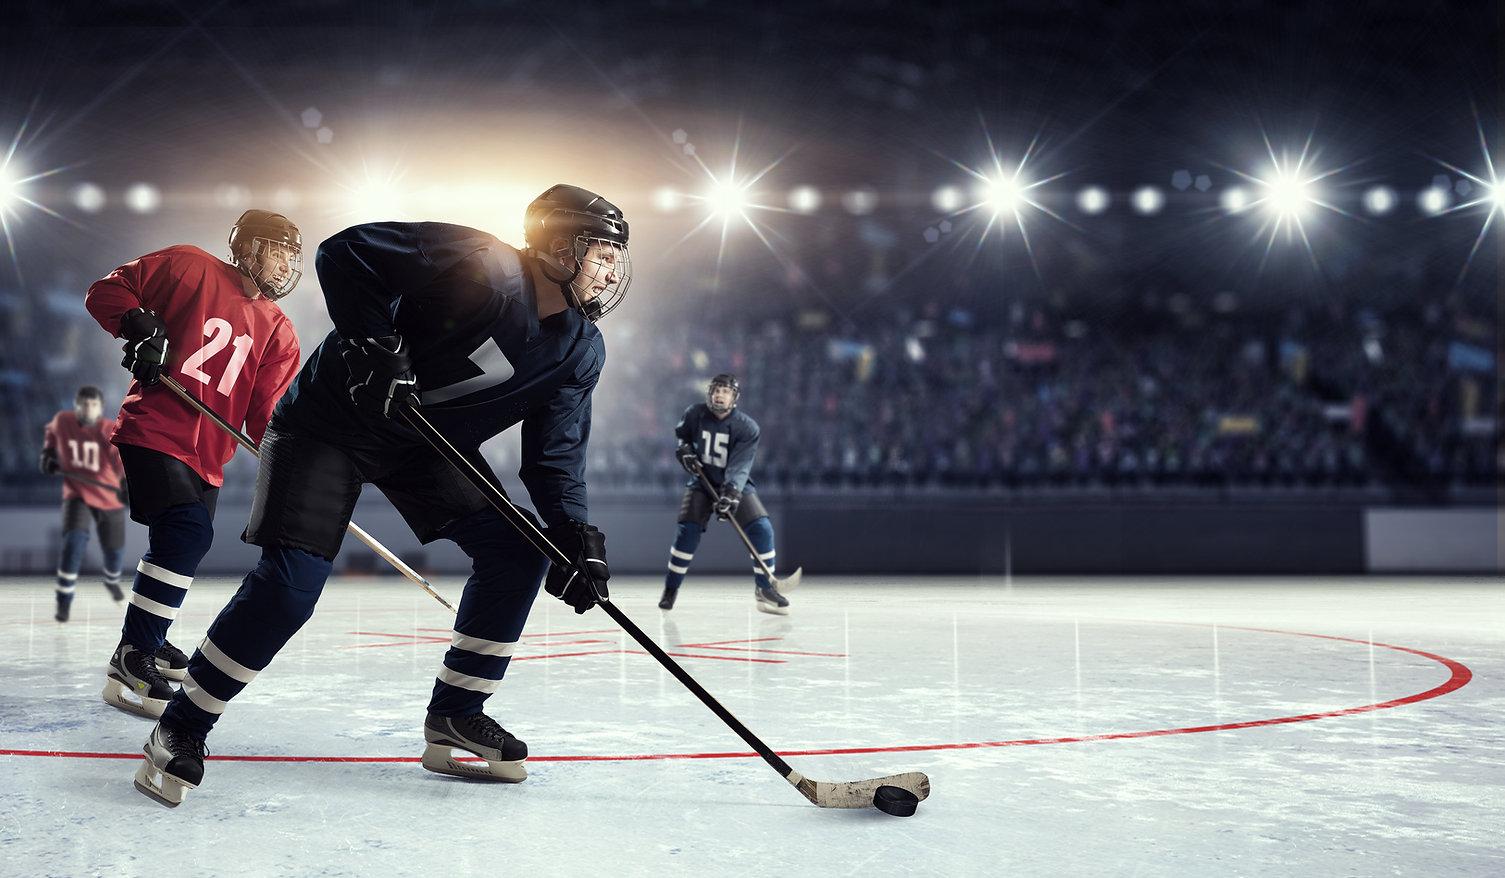 Hockey match at rink   . Mixed media.jpg